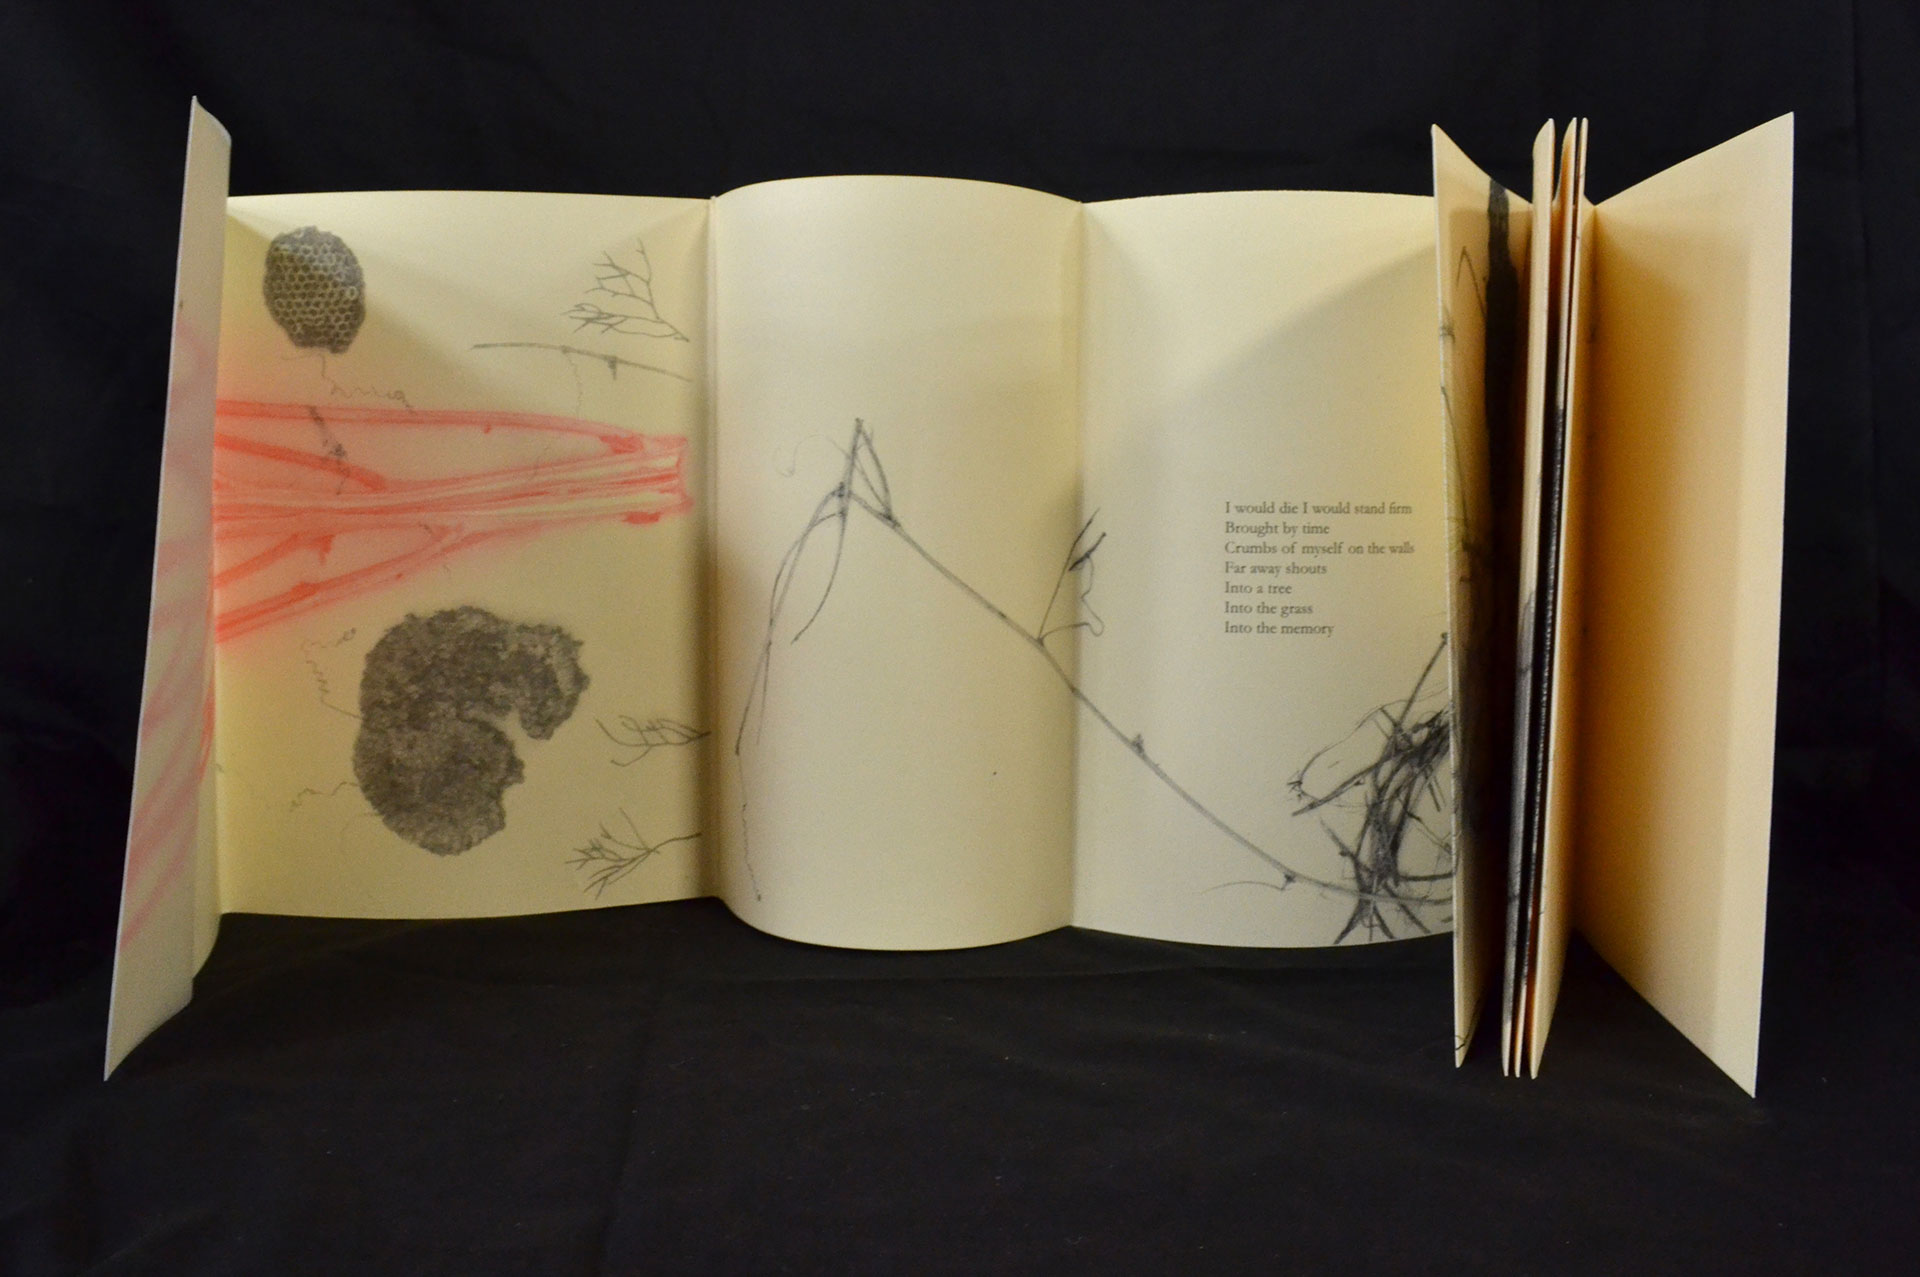 Melania Lanzini, Adagio, Risograph, monotype, drawings 2016, $250, Florence, IT